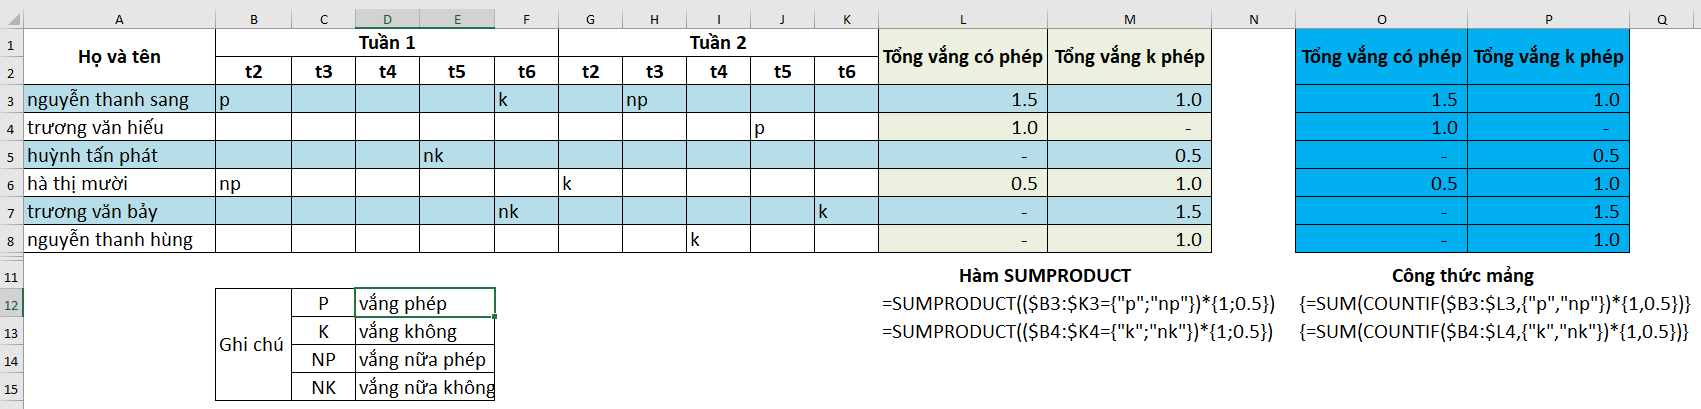 Tong hop ngay cong.png